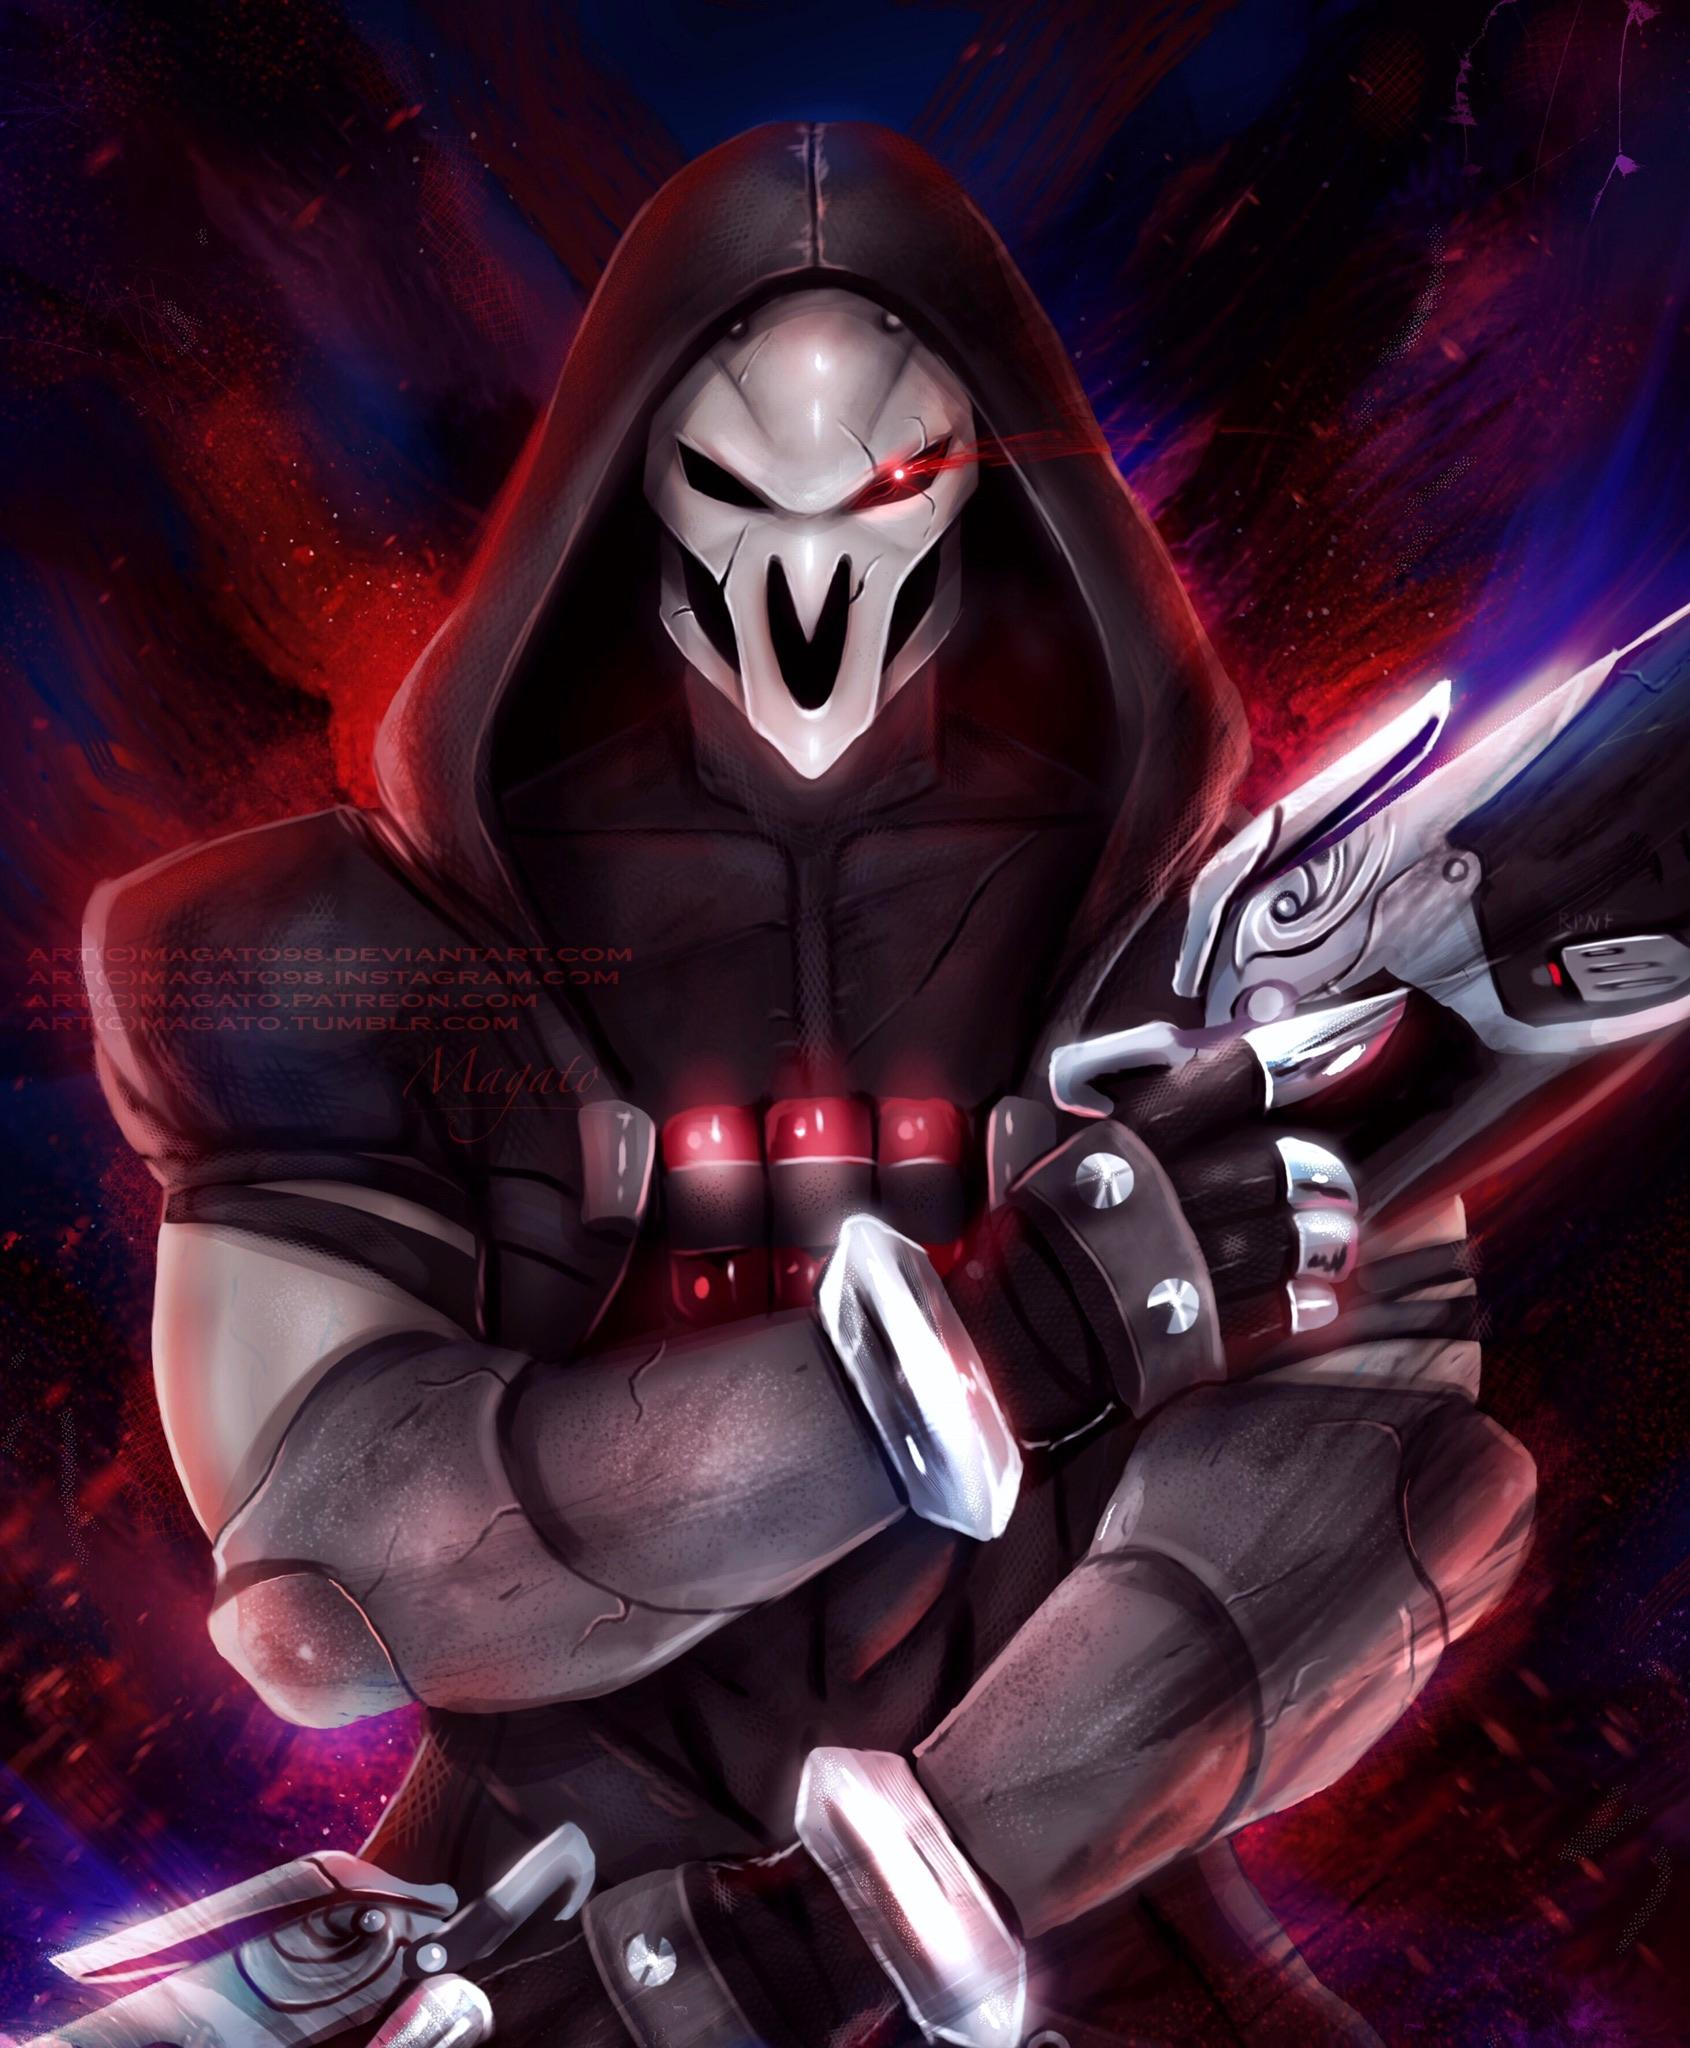 Reaper by magato98